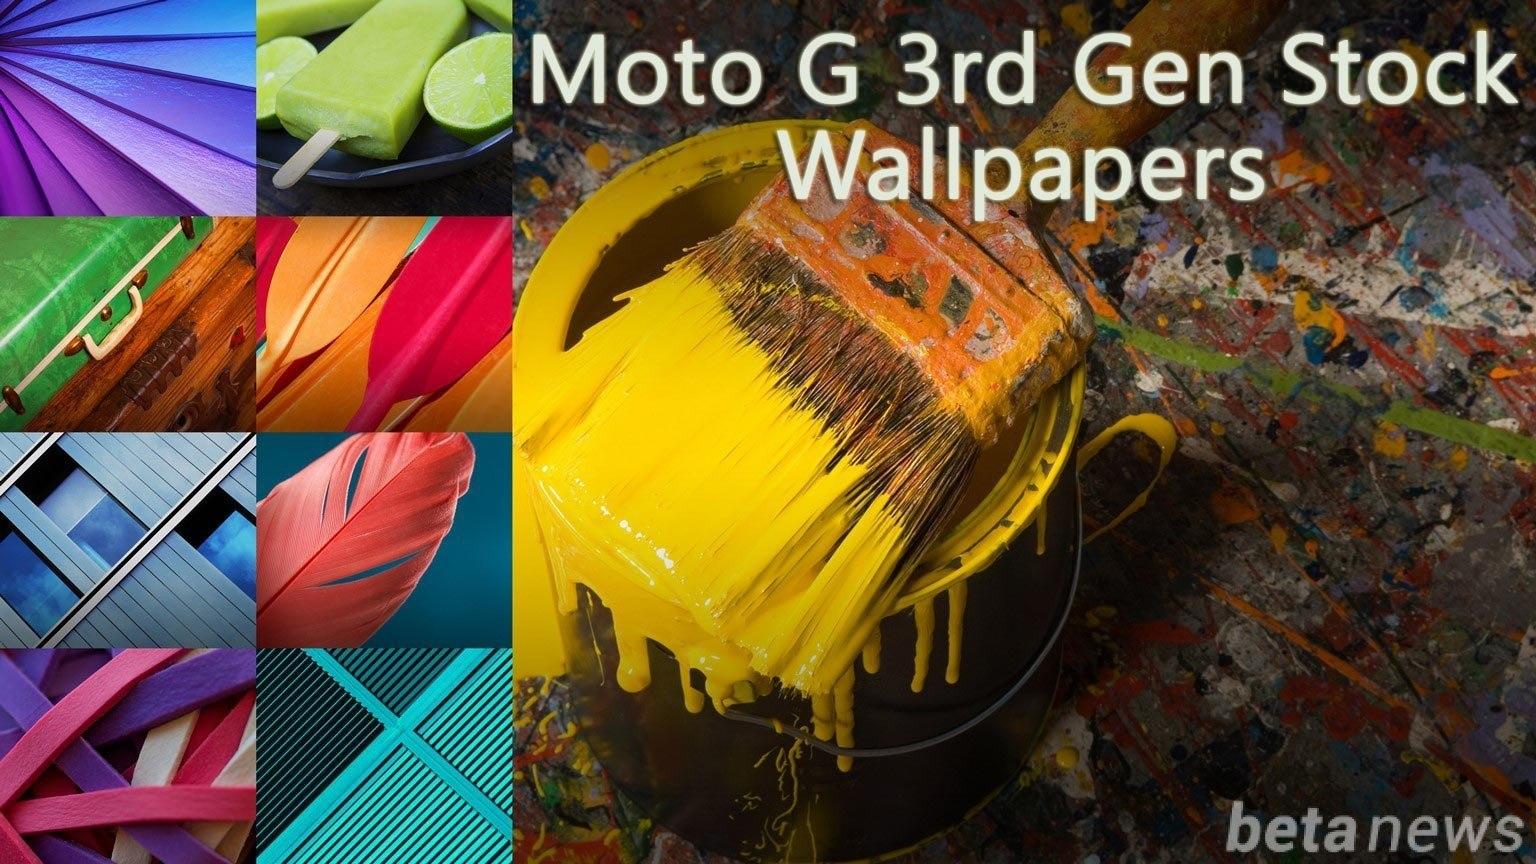 5 Inch Screen Hd Wallpapers Moto G 3rd Gen 2015 Stock Wallpapers Download Hd